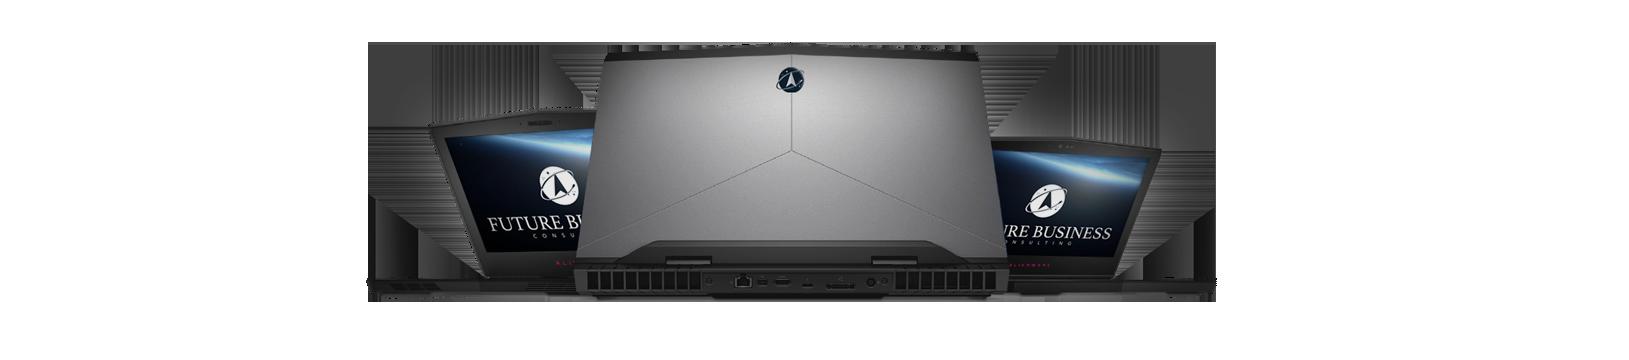 laptop-wallpaper